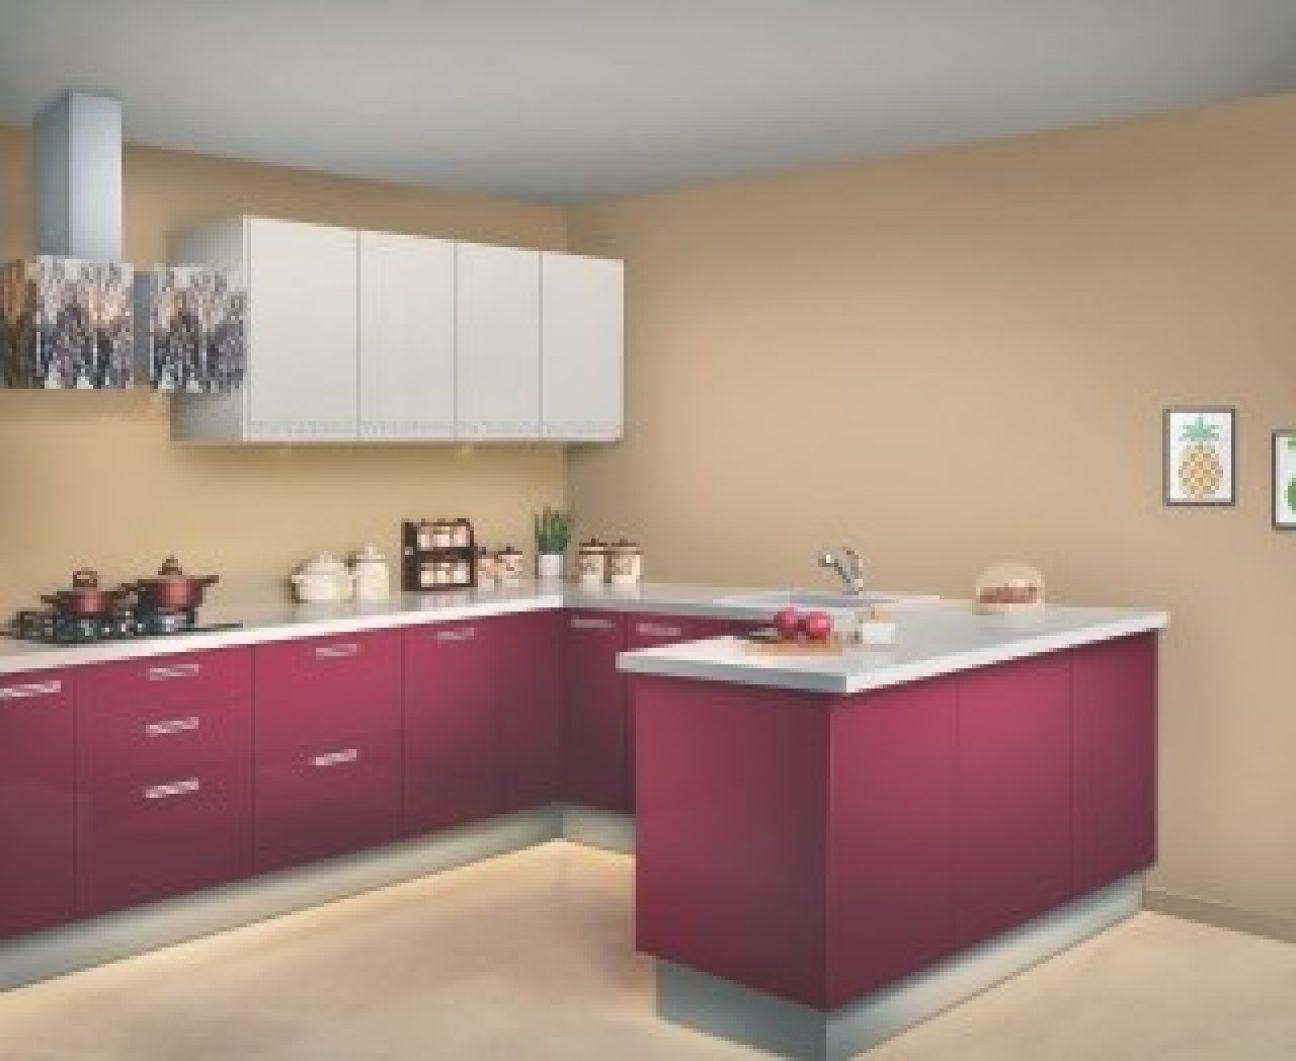 Modular Kitchens and Wardrobe Designs in India  Sleek Kitchens  Wardrobe by Asian Paints